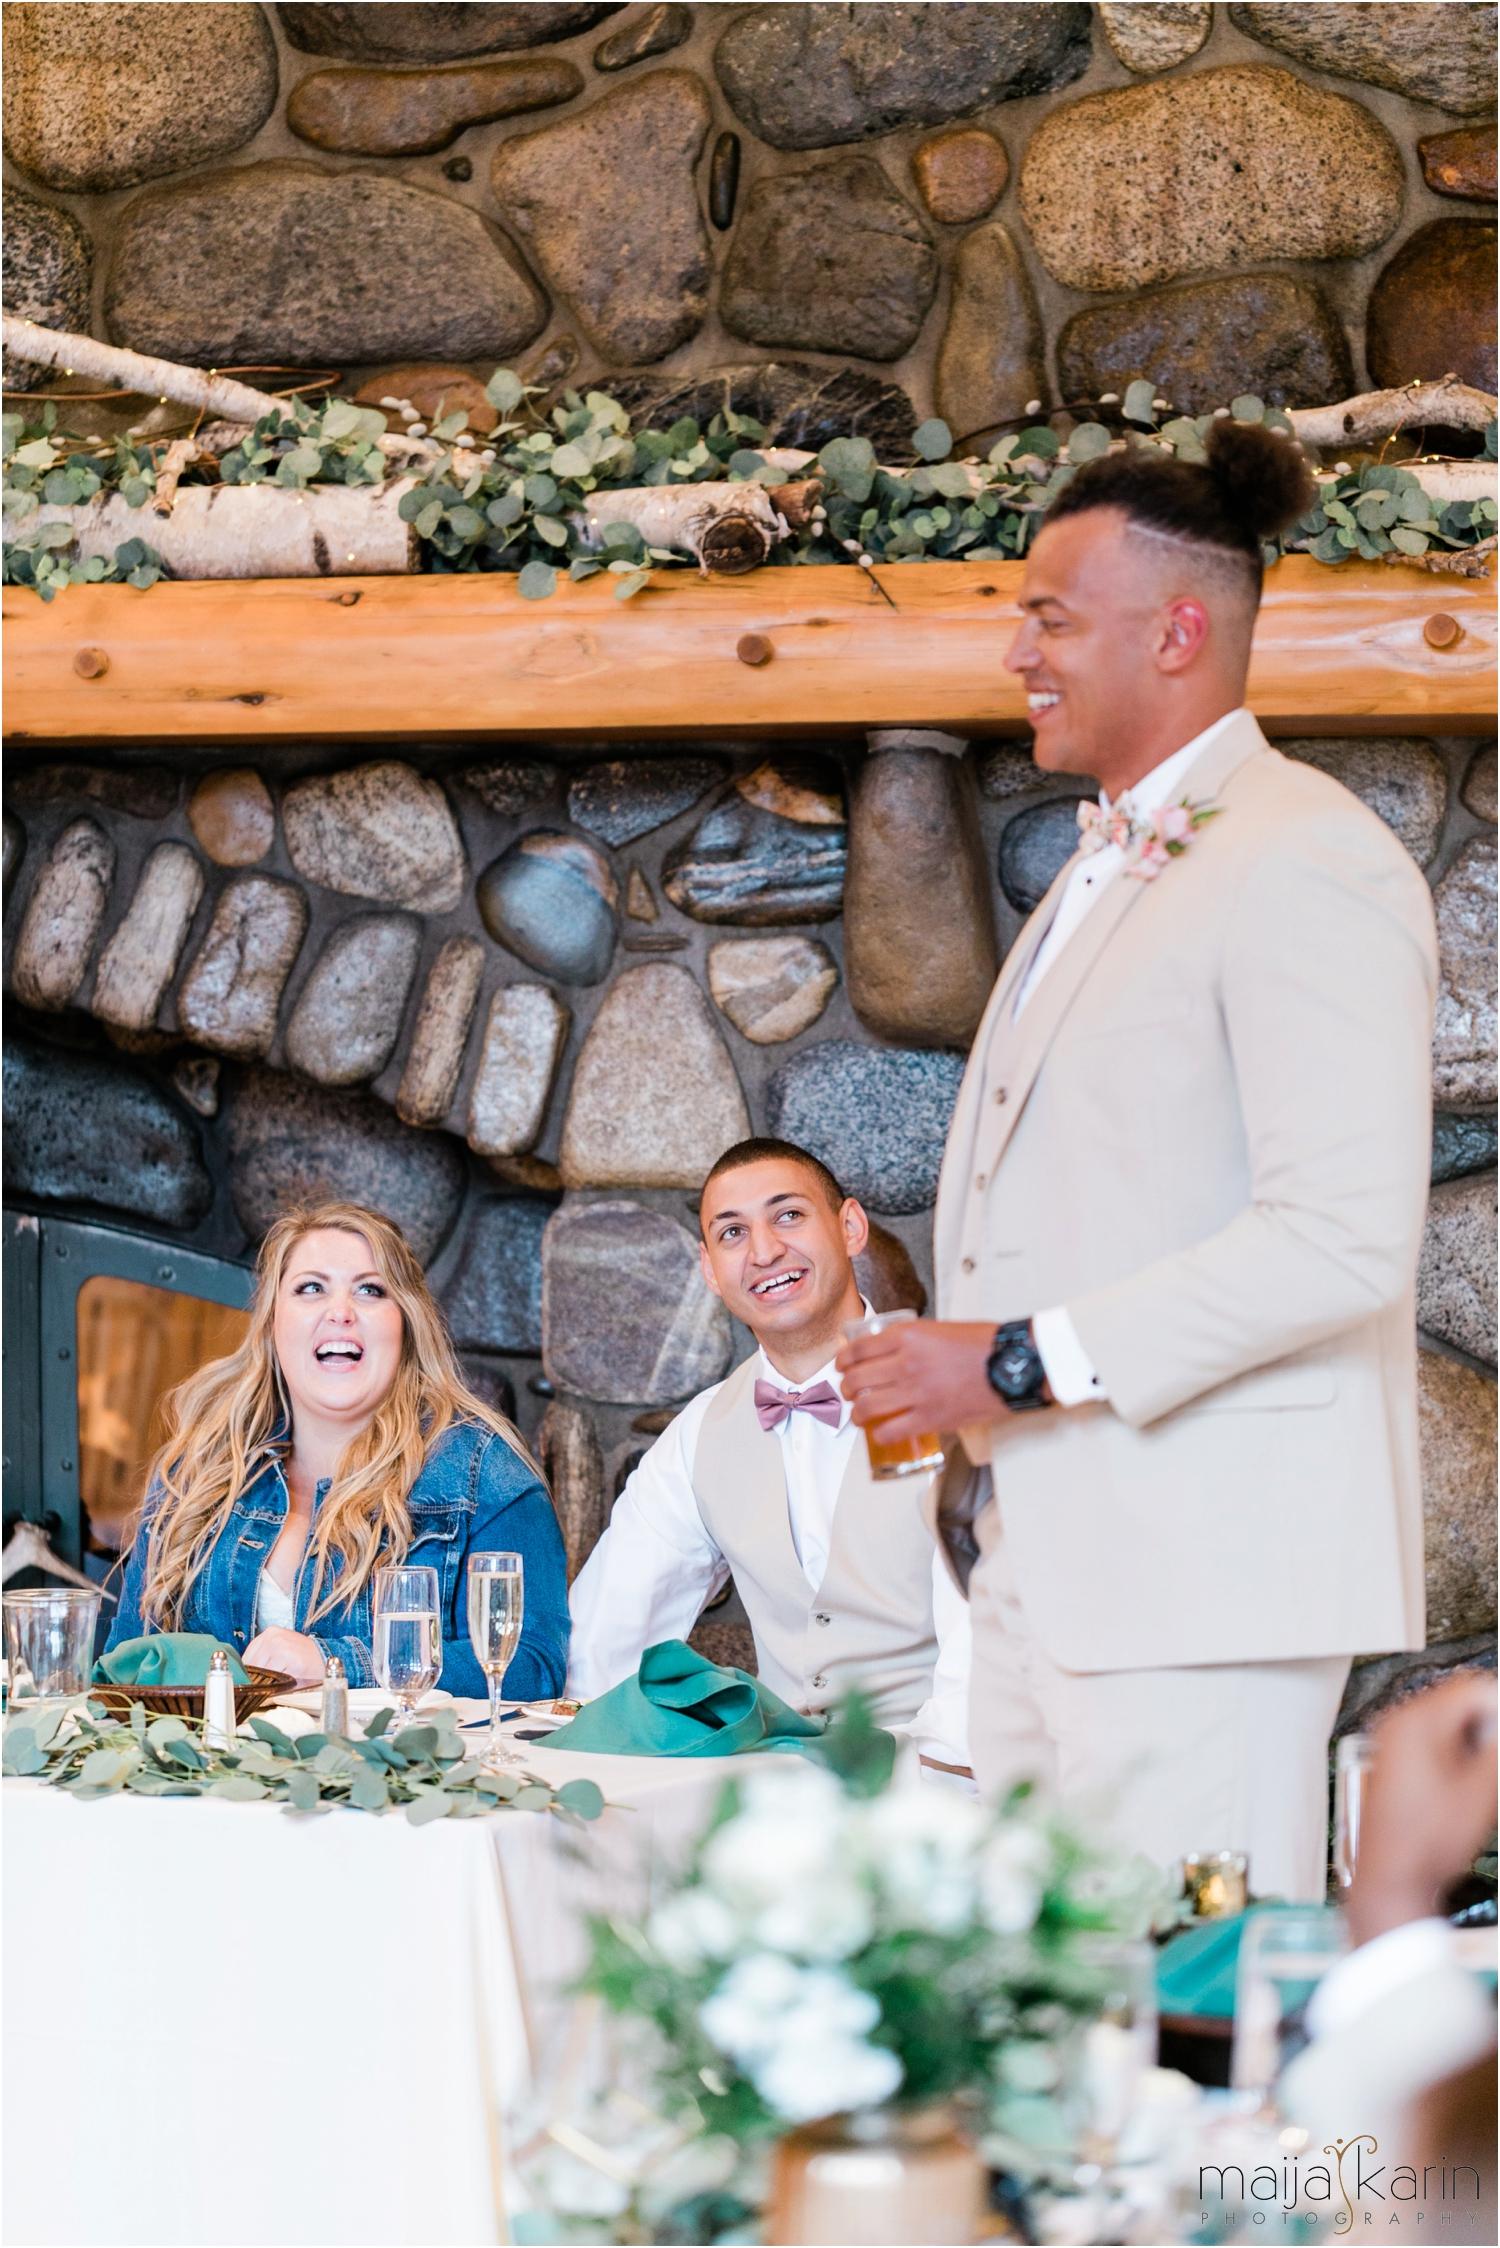 Mountain Springs Lodge wedding Maija Karin Photography%0DMaija Karin Photography%0DMaija Karin Photography%0DMountain-Springs-Lodge-Wedding-Maija-Karin-Photography_0072.jpg